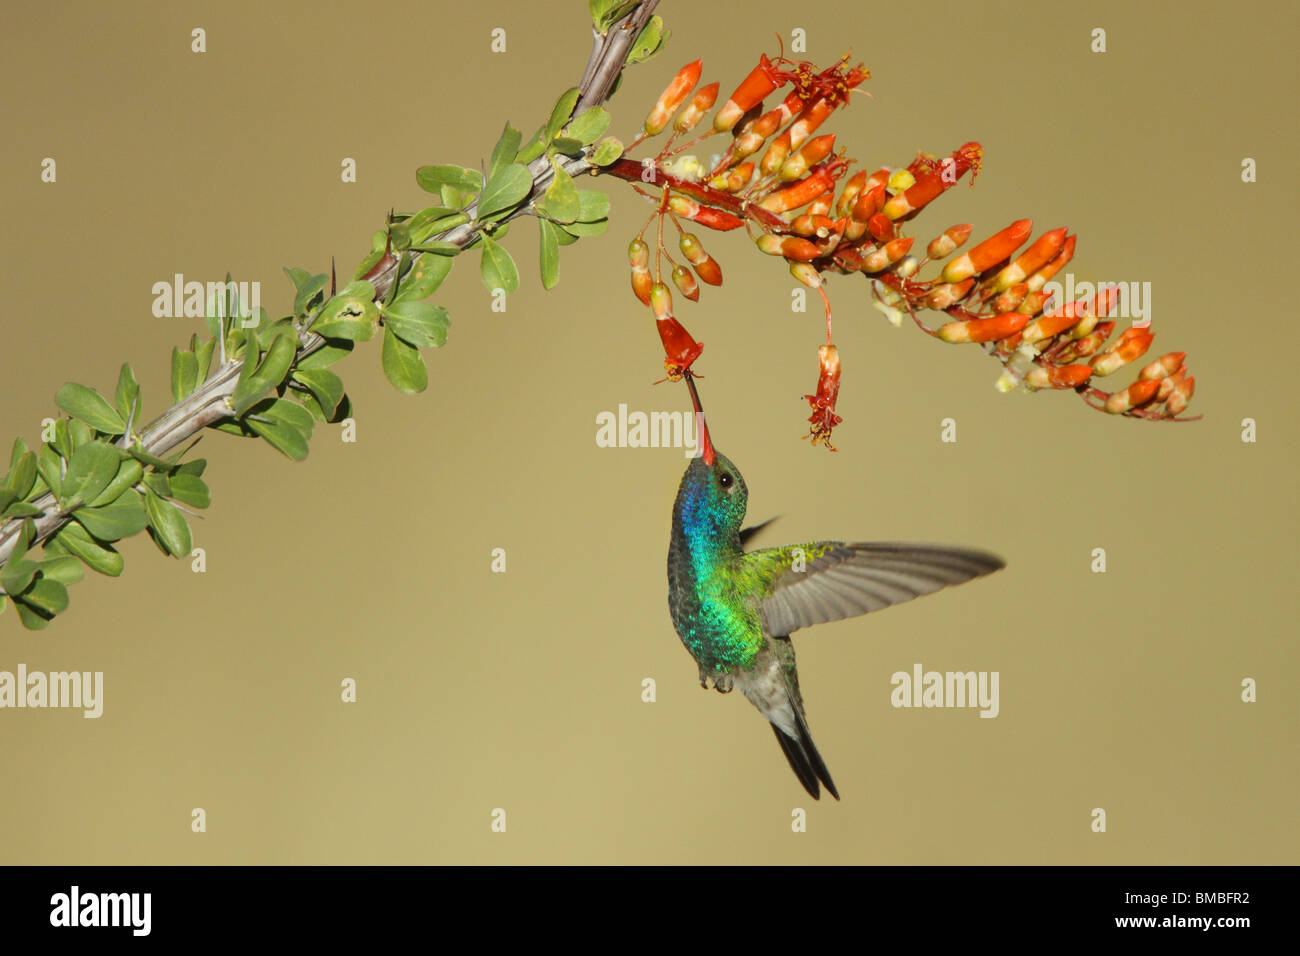 Broad-billed Hummingbird  Adult Male feeding at Ocotillo flowers. - Stock Image